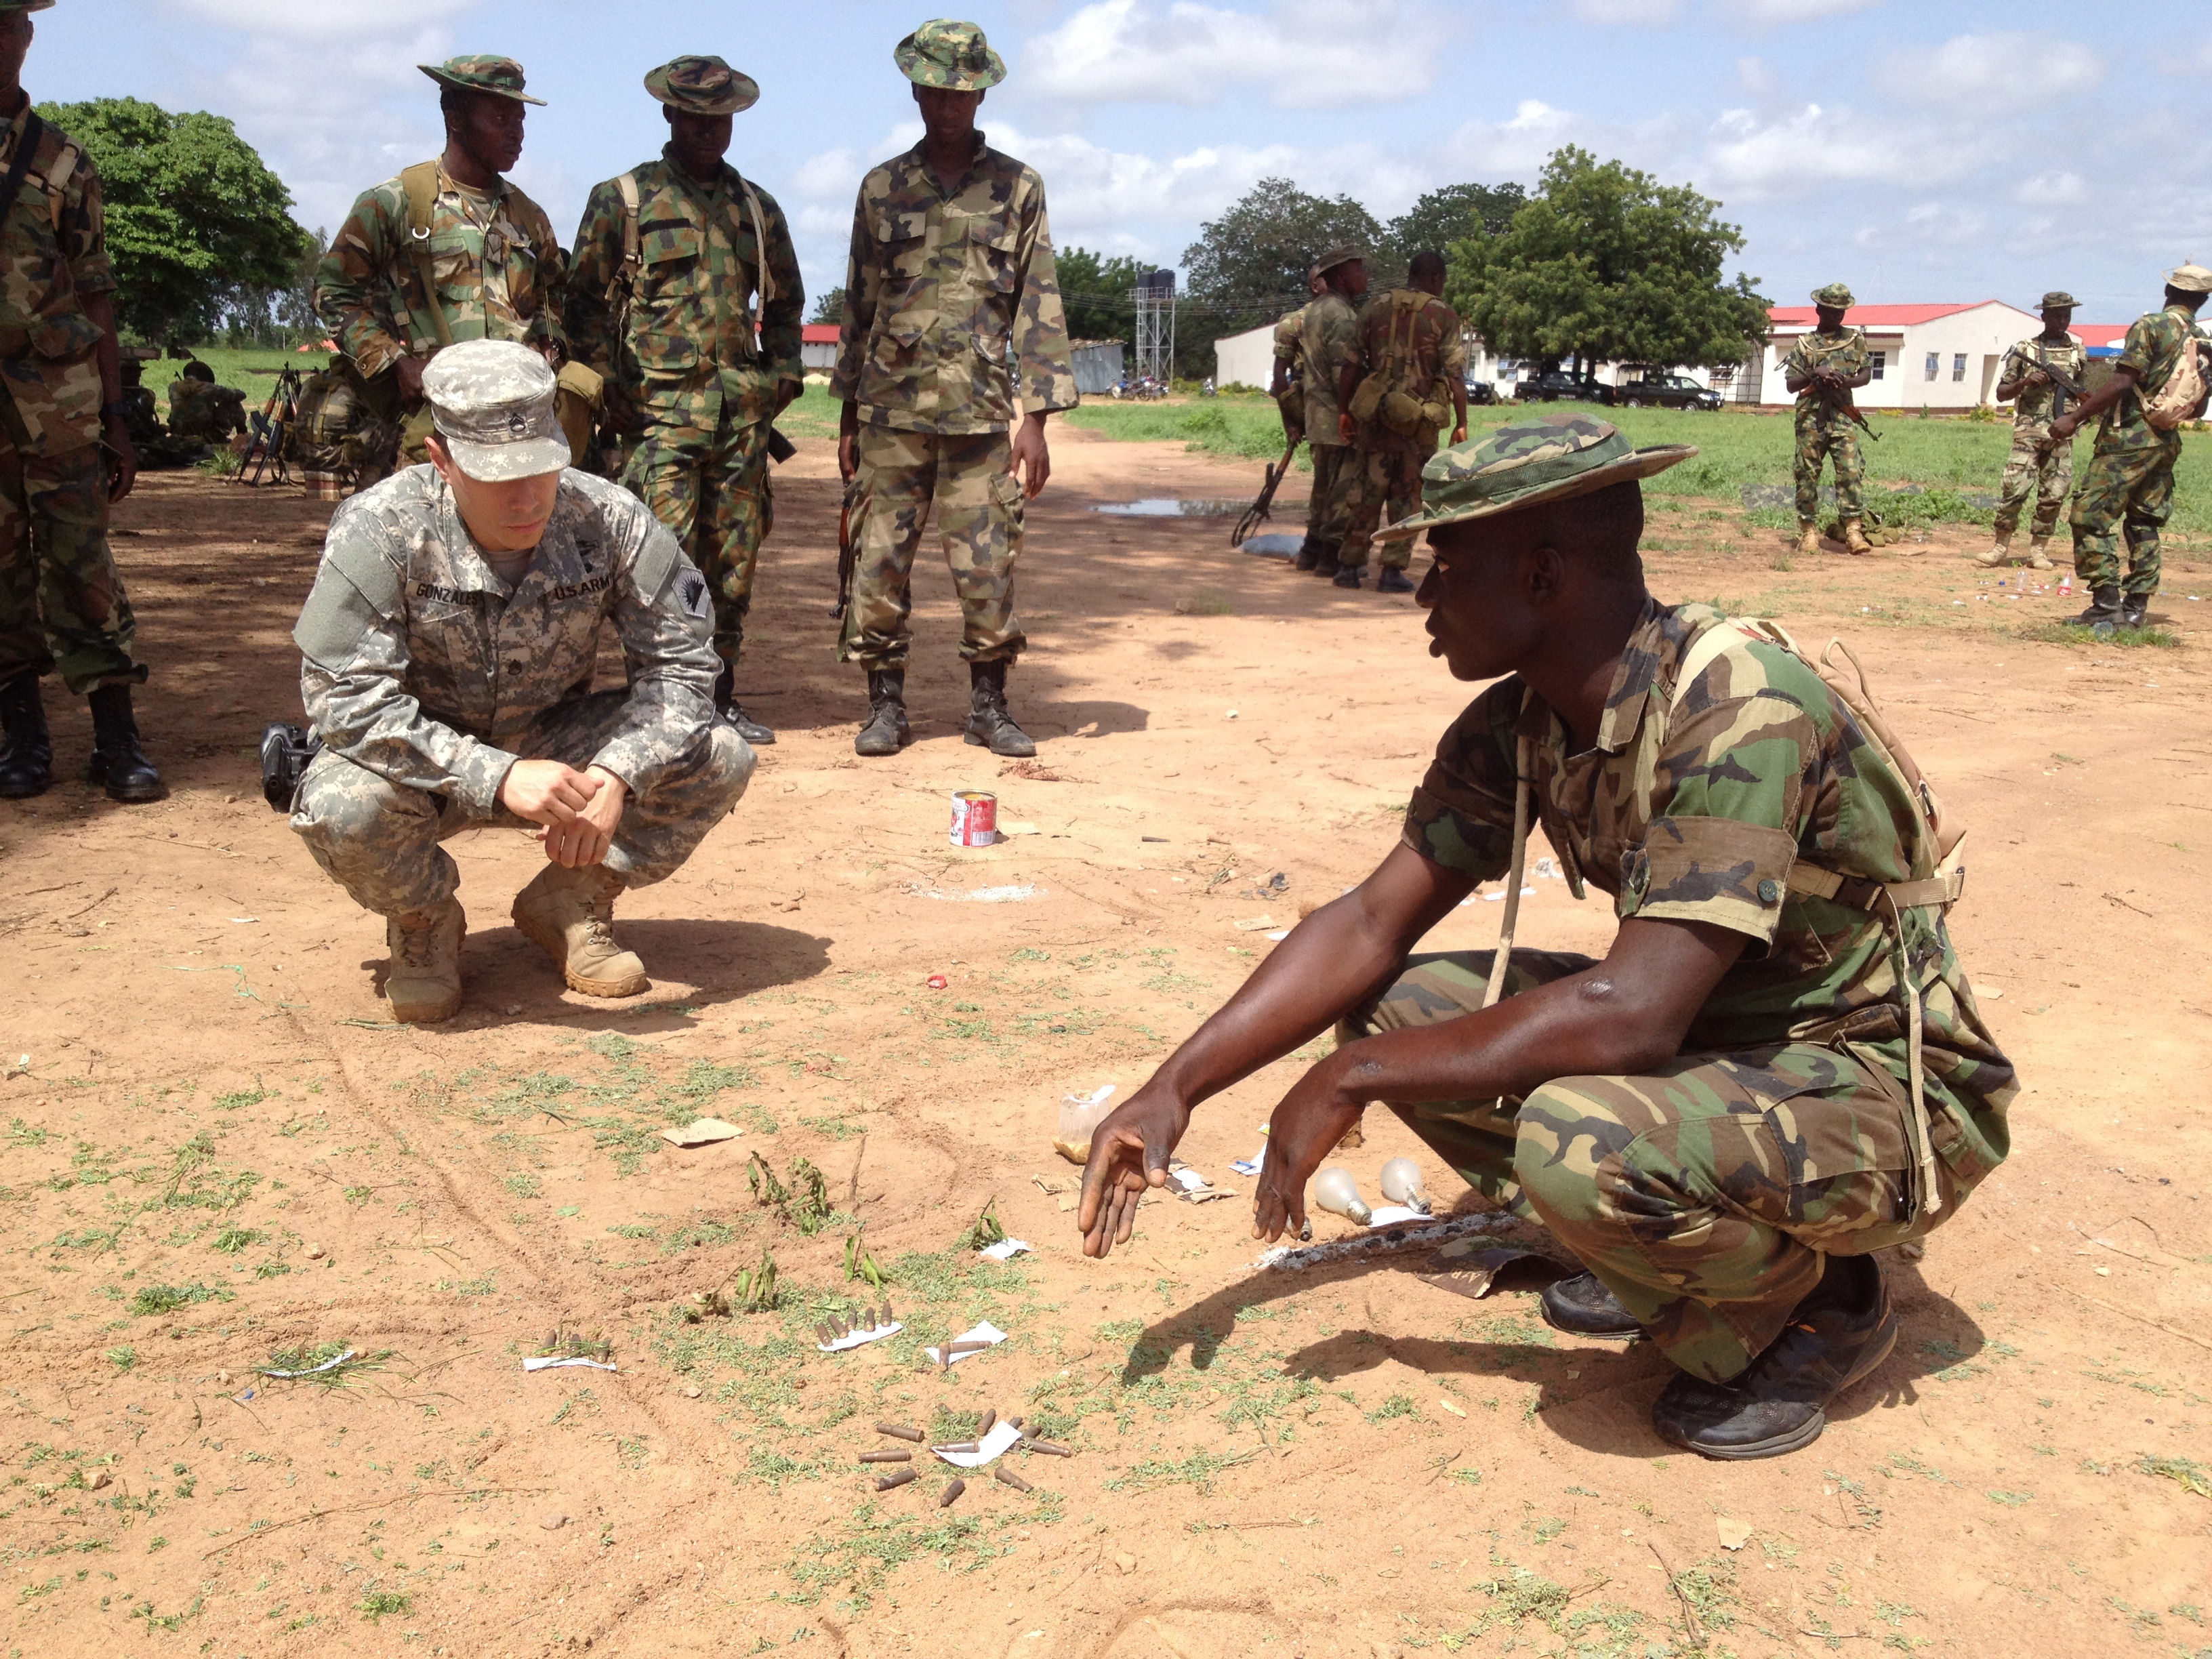 Nigerian Army Special Forces   www.imgkid.com - The Image ...  Nigerian Army Special Forces